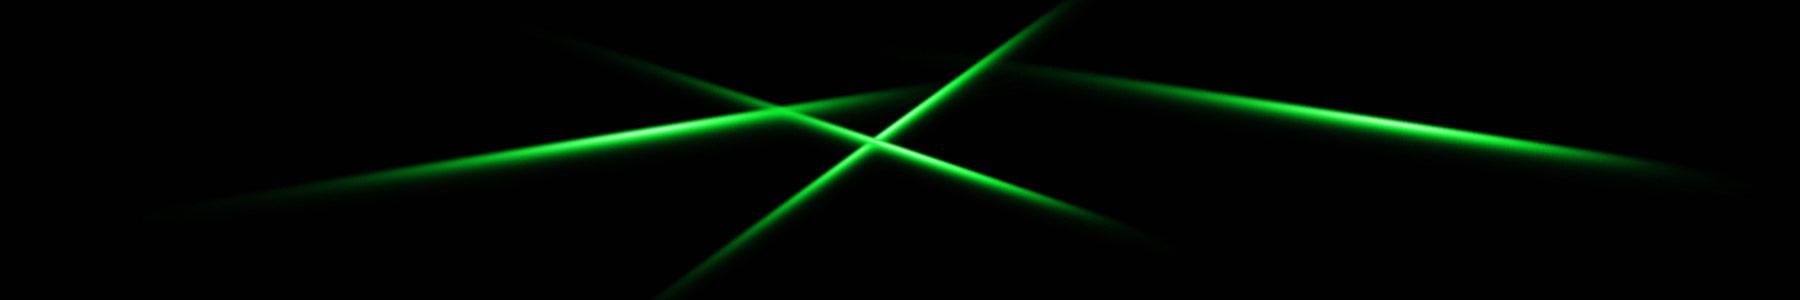 lasergame-fuselier